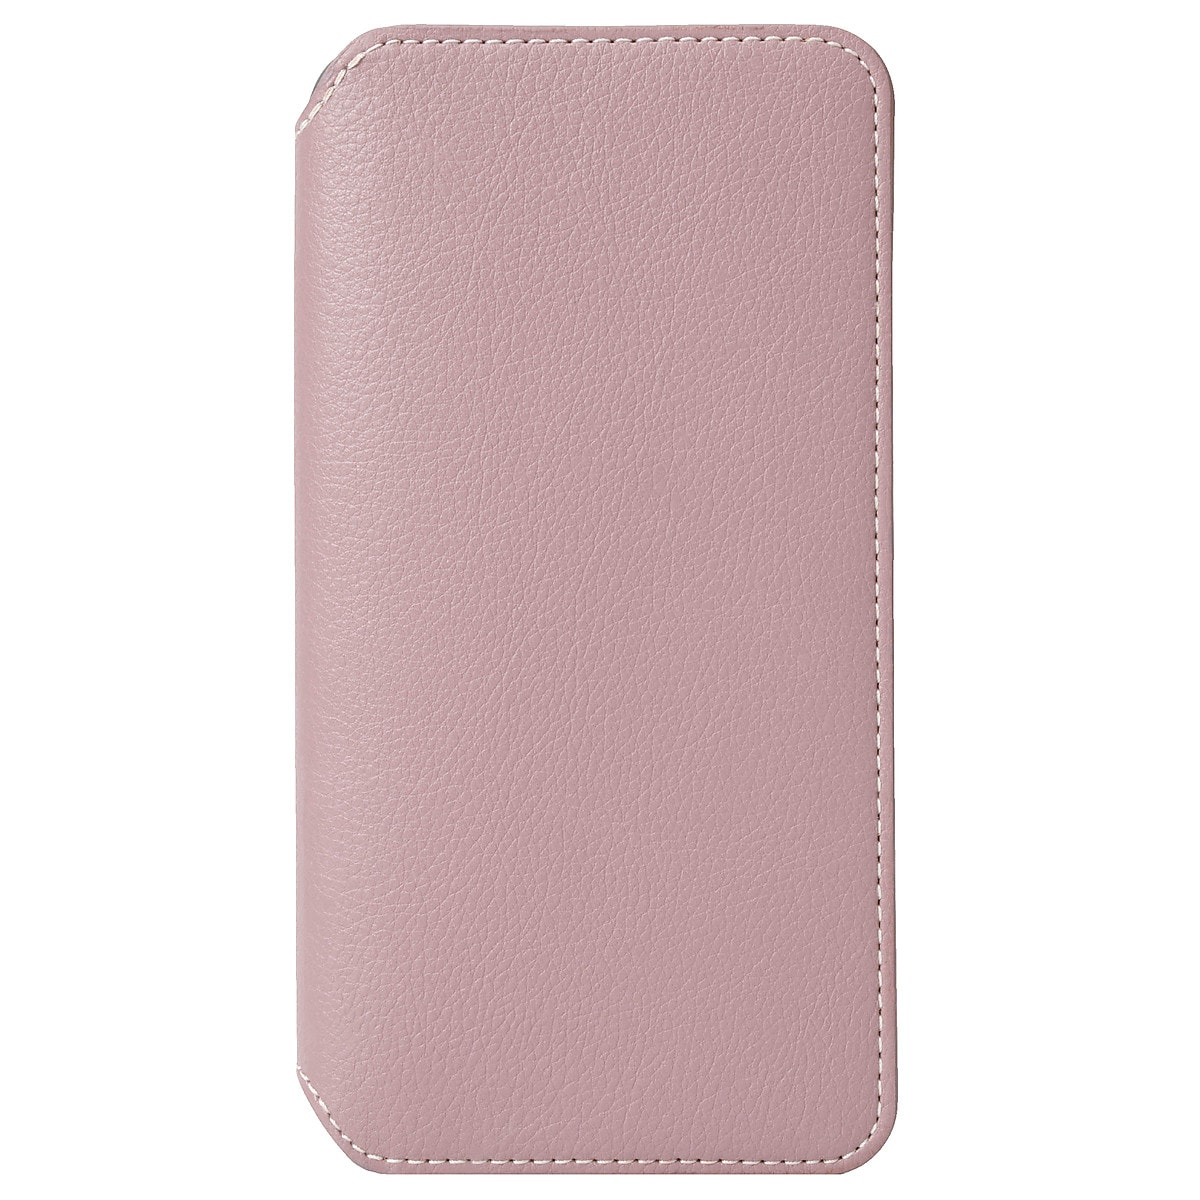 Krusell Pixbo SlimWallet lommebokfutteral for iPhone XR